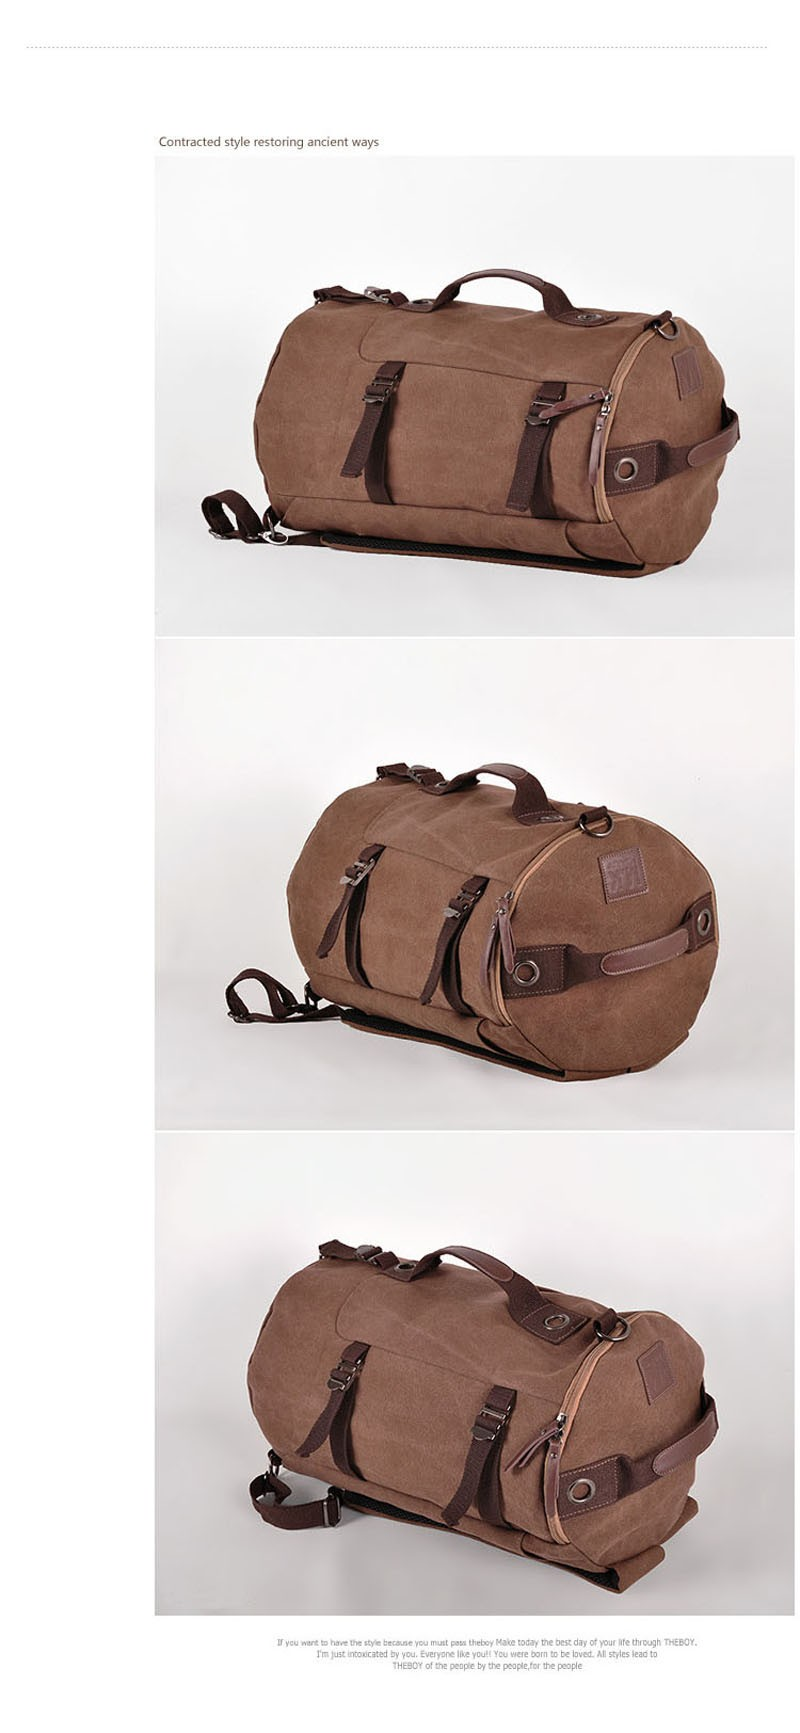 Men's Multi-Functional Backpack Vintage Shoulder Bag High Quality Canvas Male Bagpack Rucksack Travel Luggage for Weekend 33